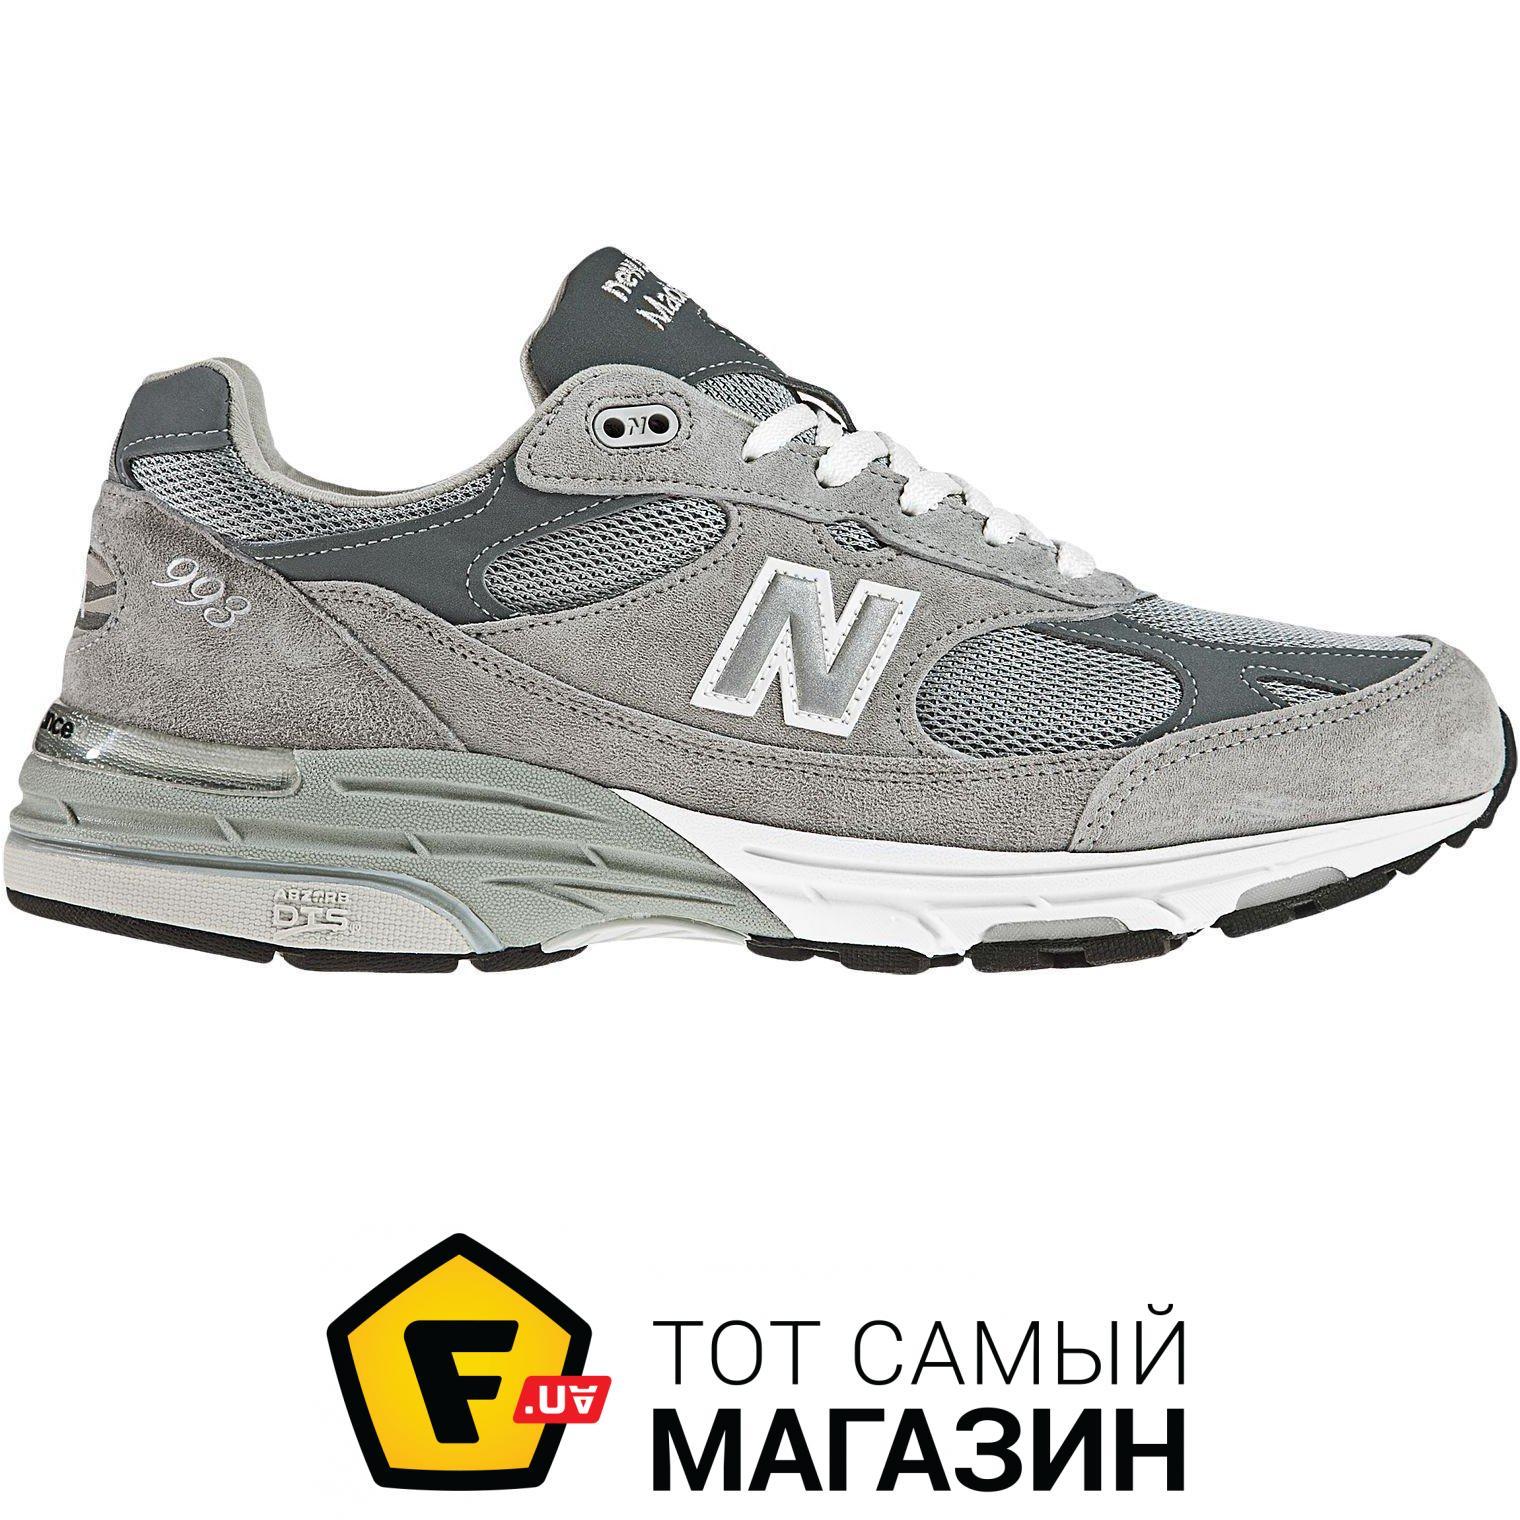 ᐈ NEW BALANCE Classic 993 Running 8b1213a1cb551